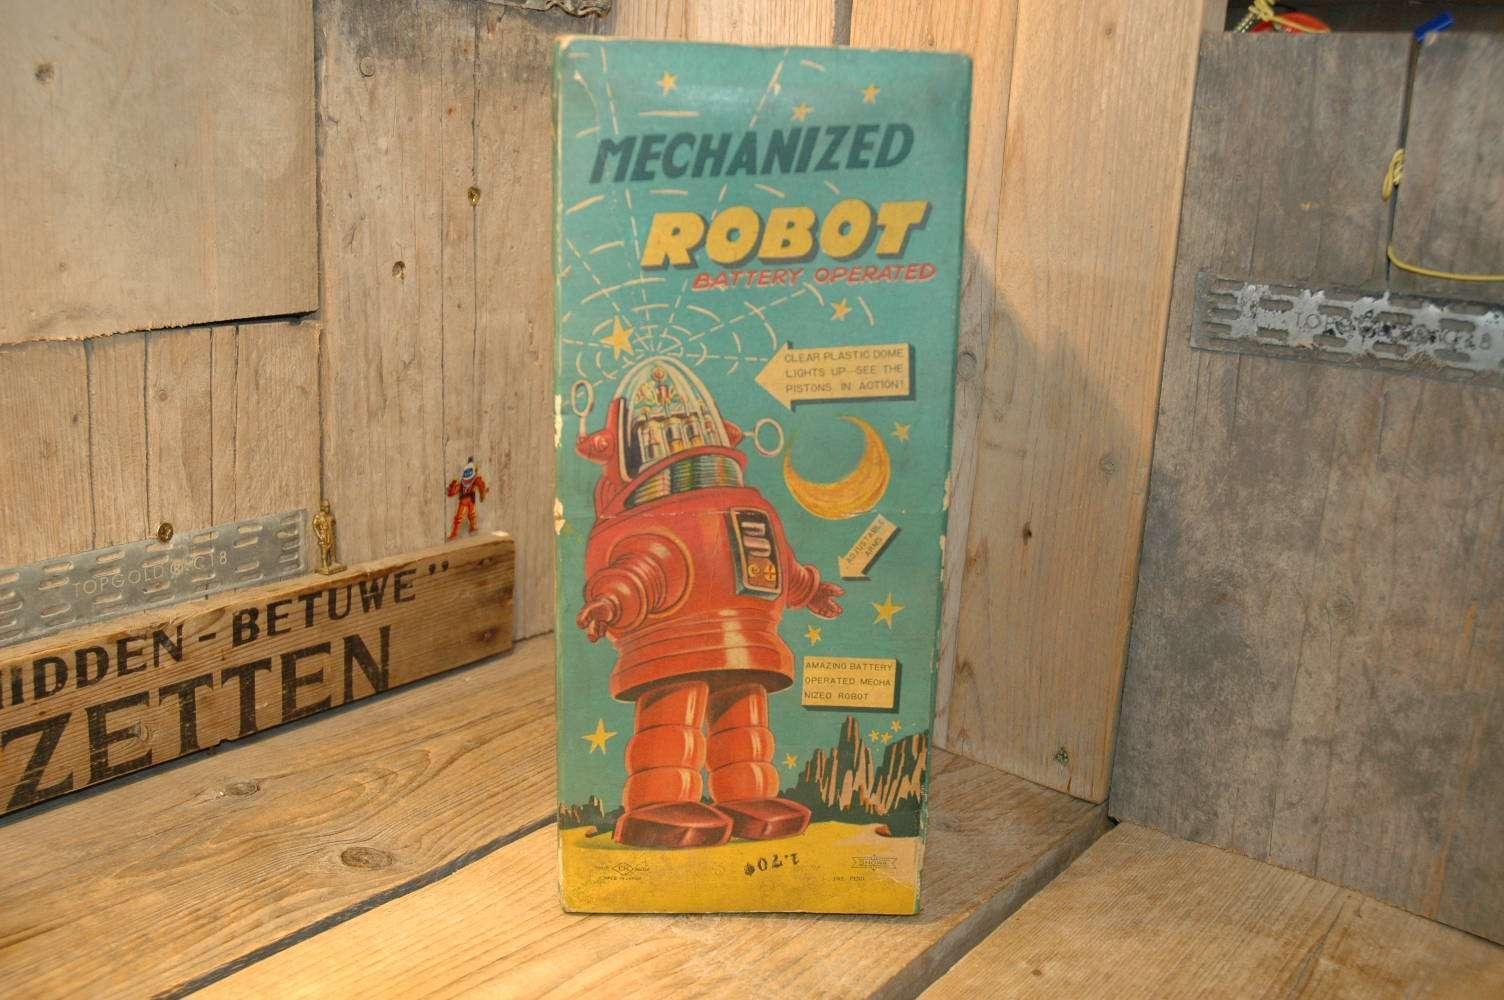 Nomura - Mechanized Robby Robot ( First Version )